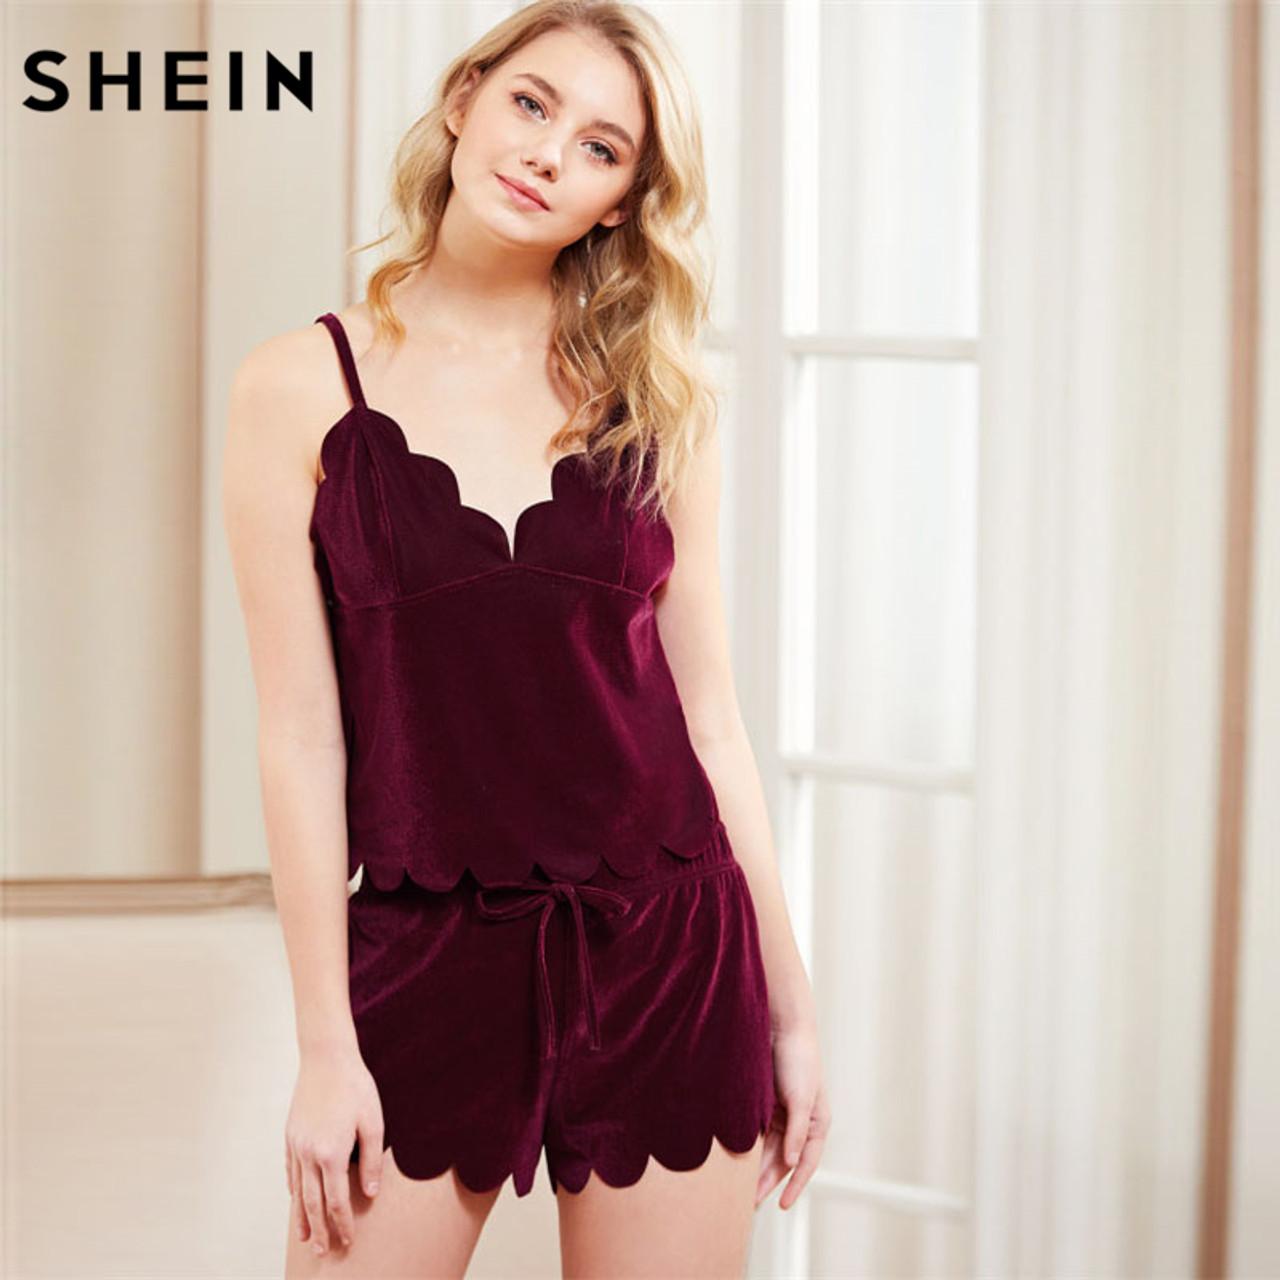 06f38855659 SHEIN Women Sleeping Summer Nightwear Pyjama Burgundy Spaghetti Strap  Scalloped Trim Velvet Cami Top  amp  ...